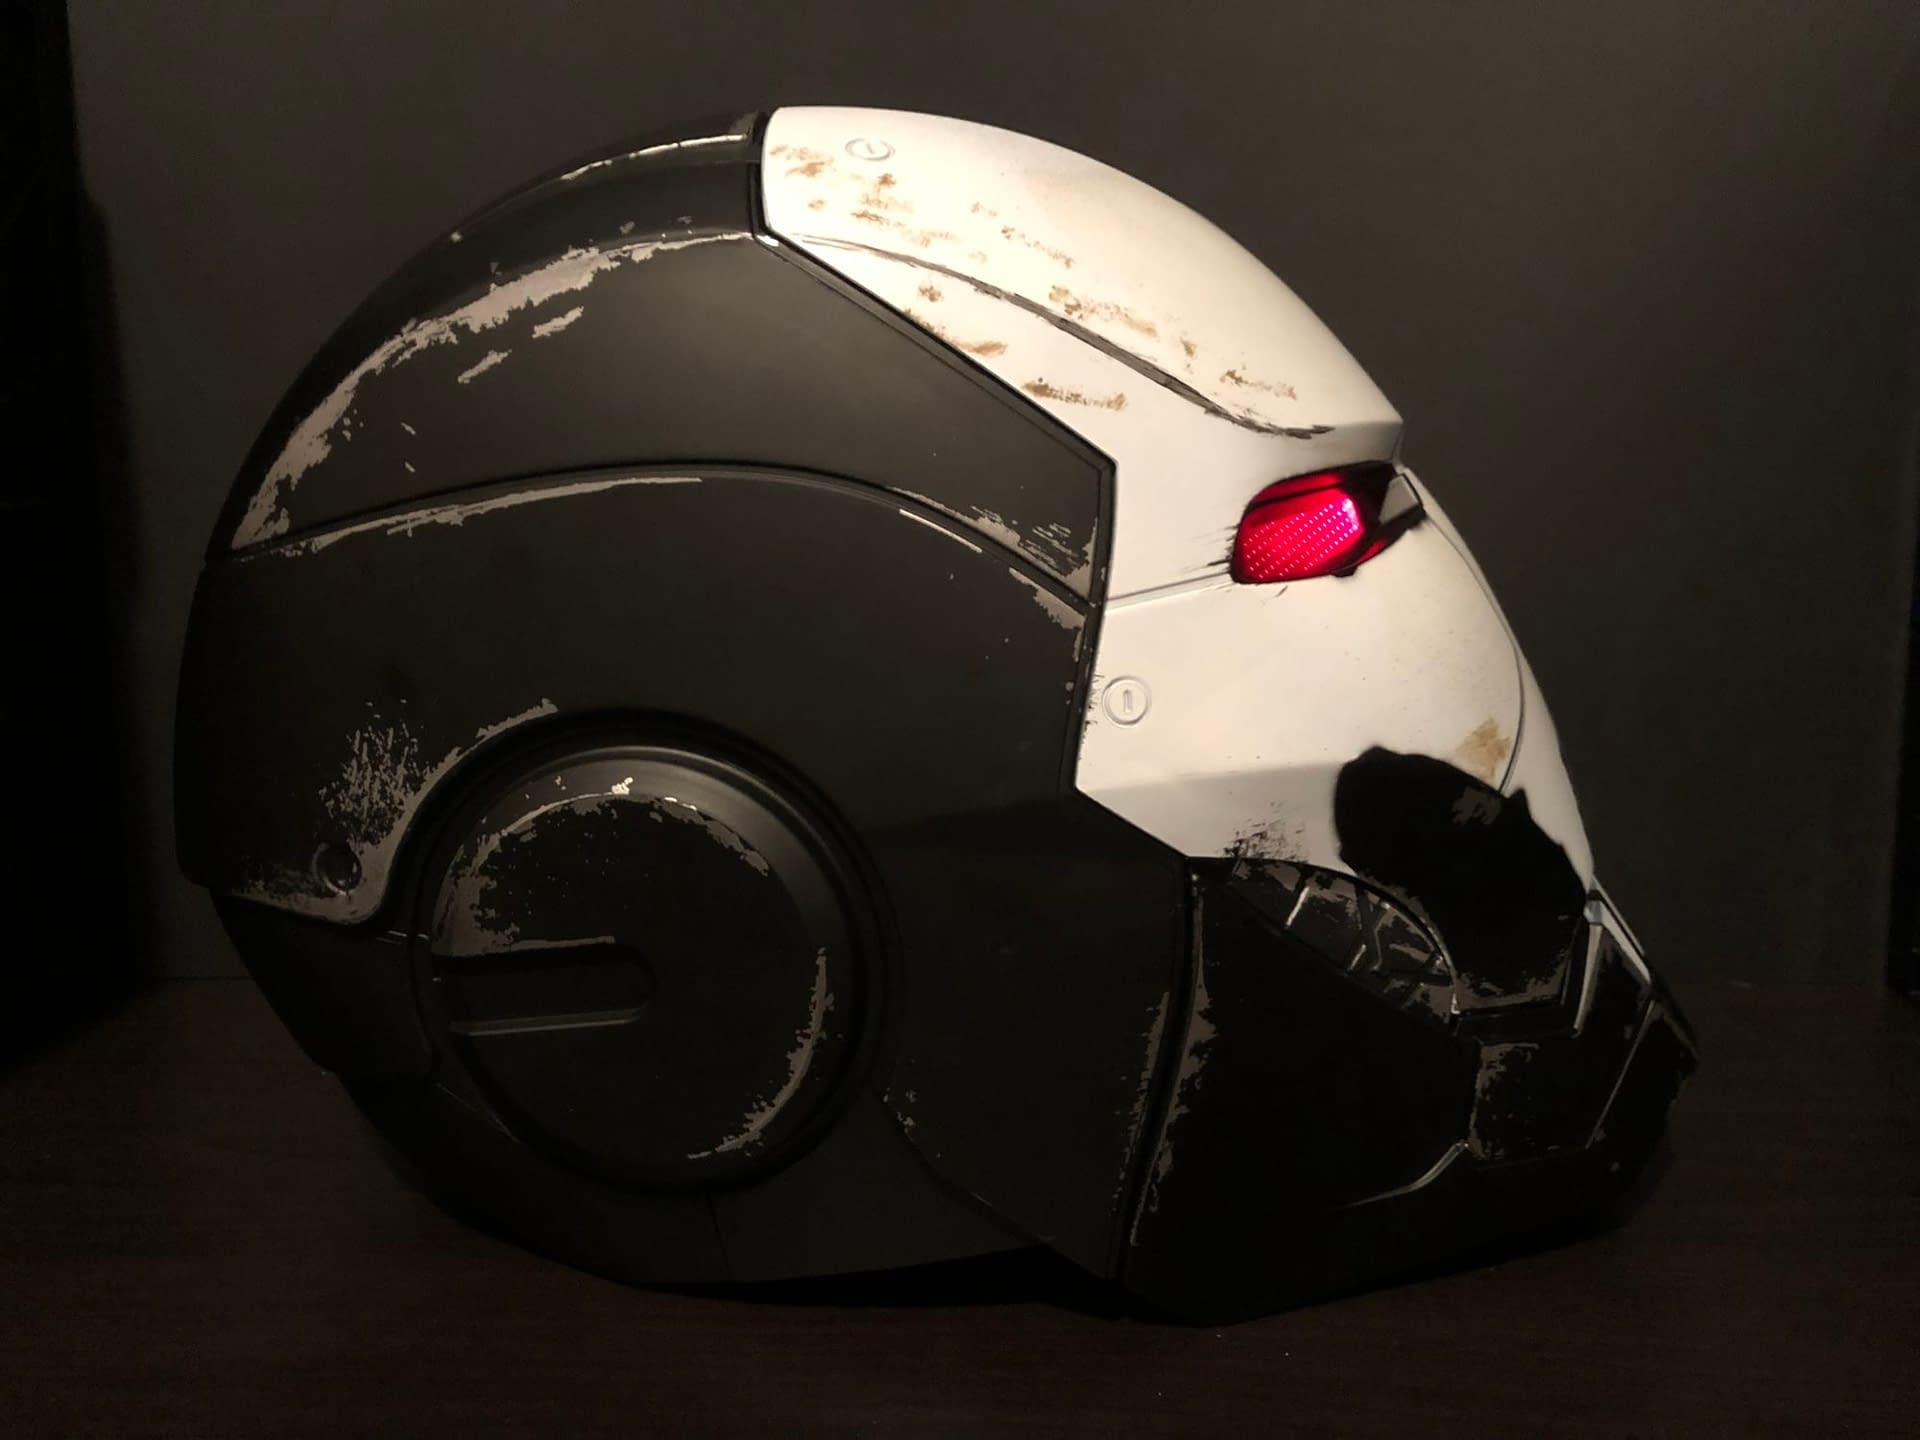 Punisher War Machine Helmet Prepares You for War [Review]